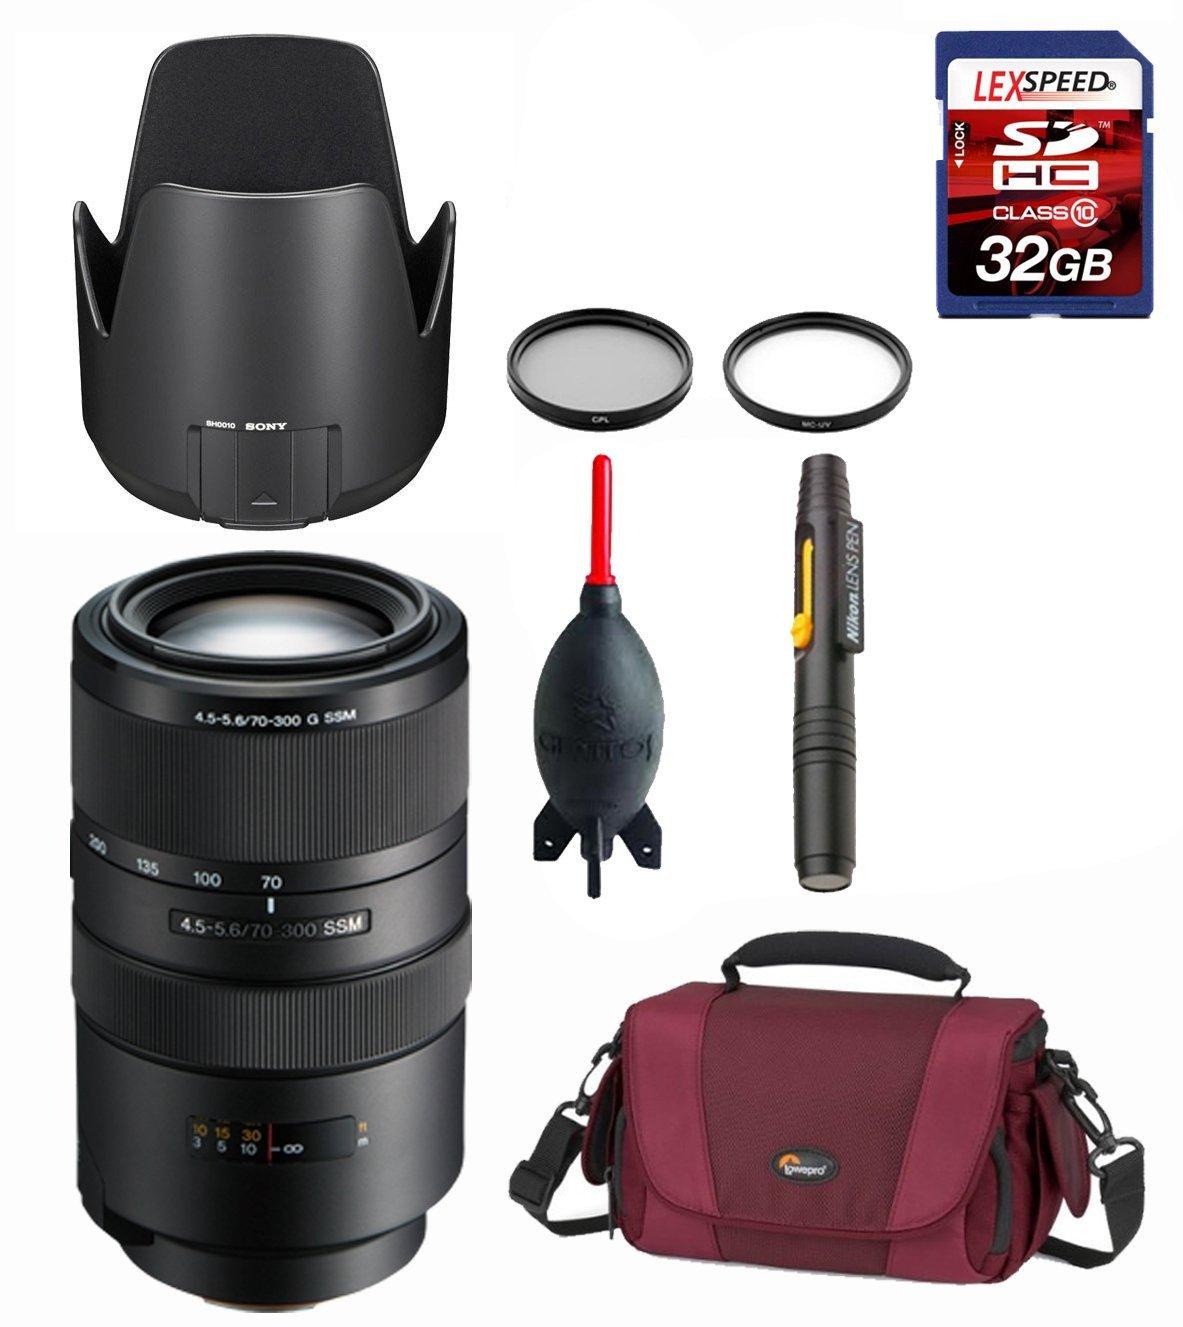 49mm 2x Telephoto Lens for Sony Alpha NEX-5K with Sony 18-55mm f//3.5-5.8 SEL Zoom Lens DavisMAX Fibercloth Deluxe Lens Bundle